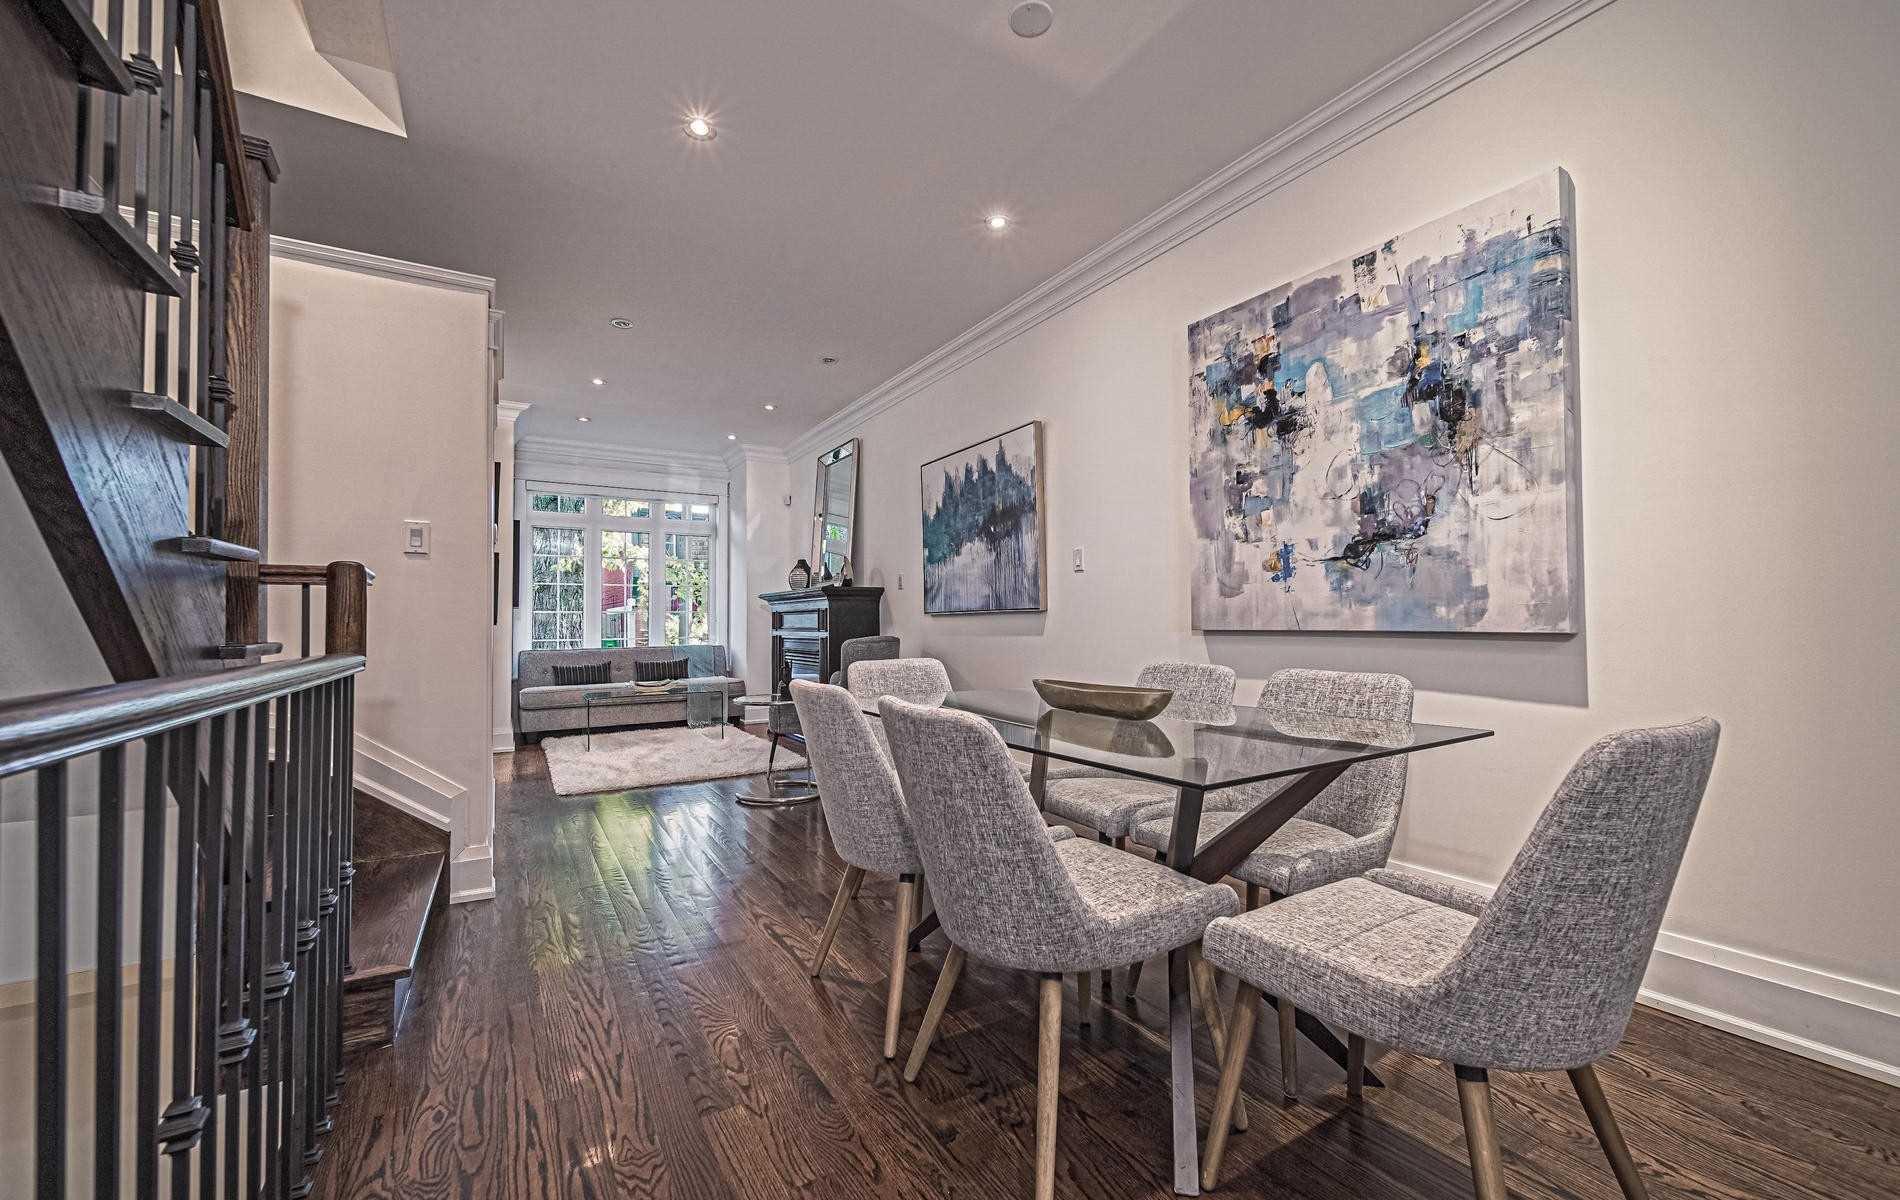 Photo 4: Photos: 216A Hamilton Street in Toronto: South Riverdale House (3-Storey) for sale (Toronto E01)  : MLS®# E4619870